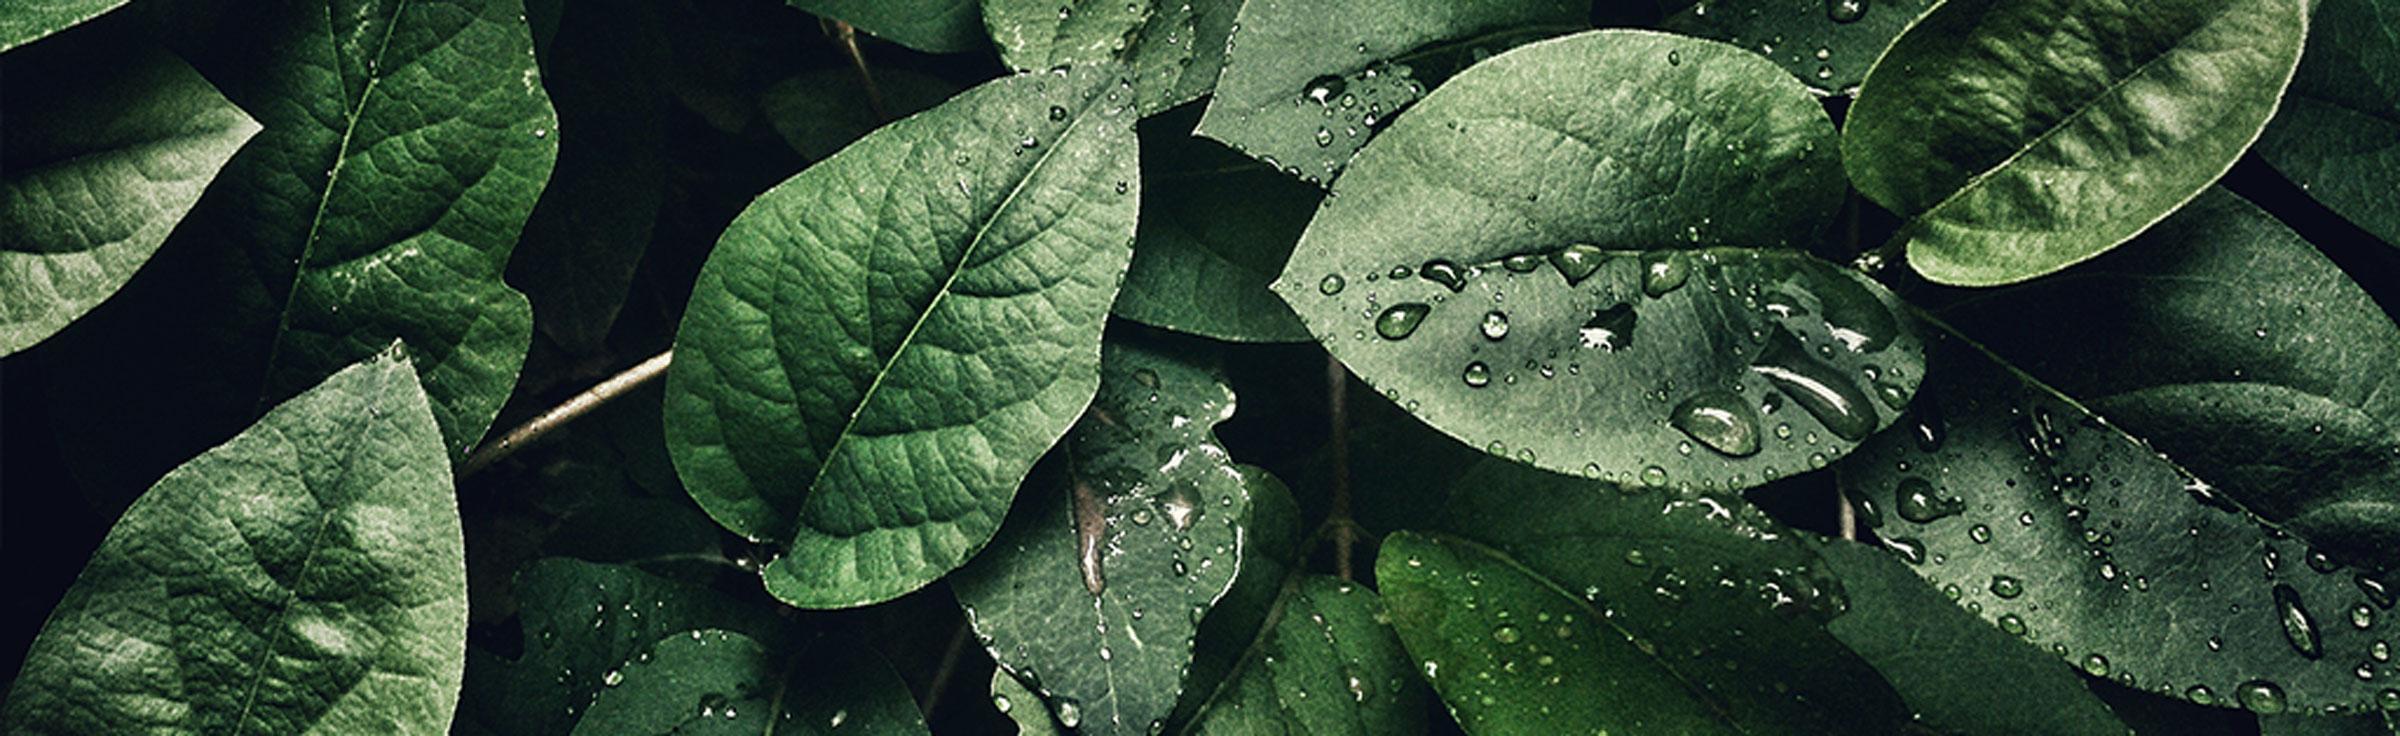 Why Green,Why Elysium -